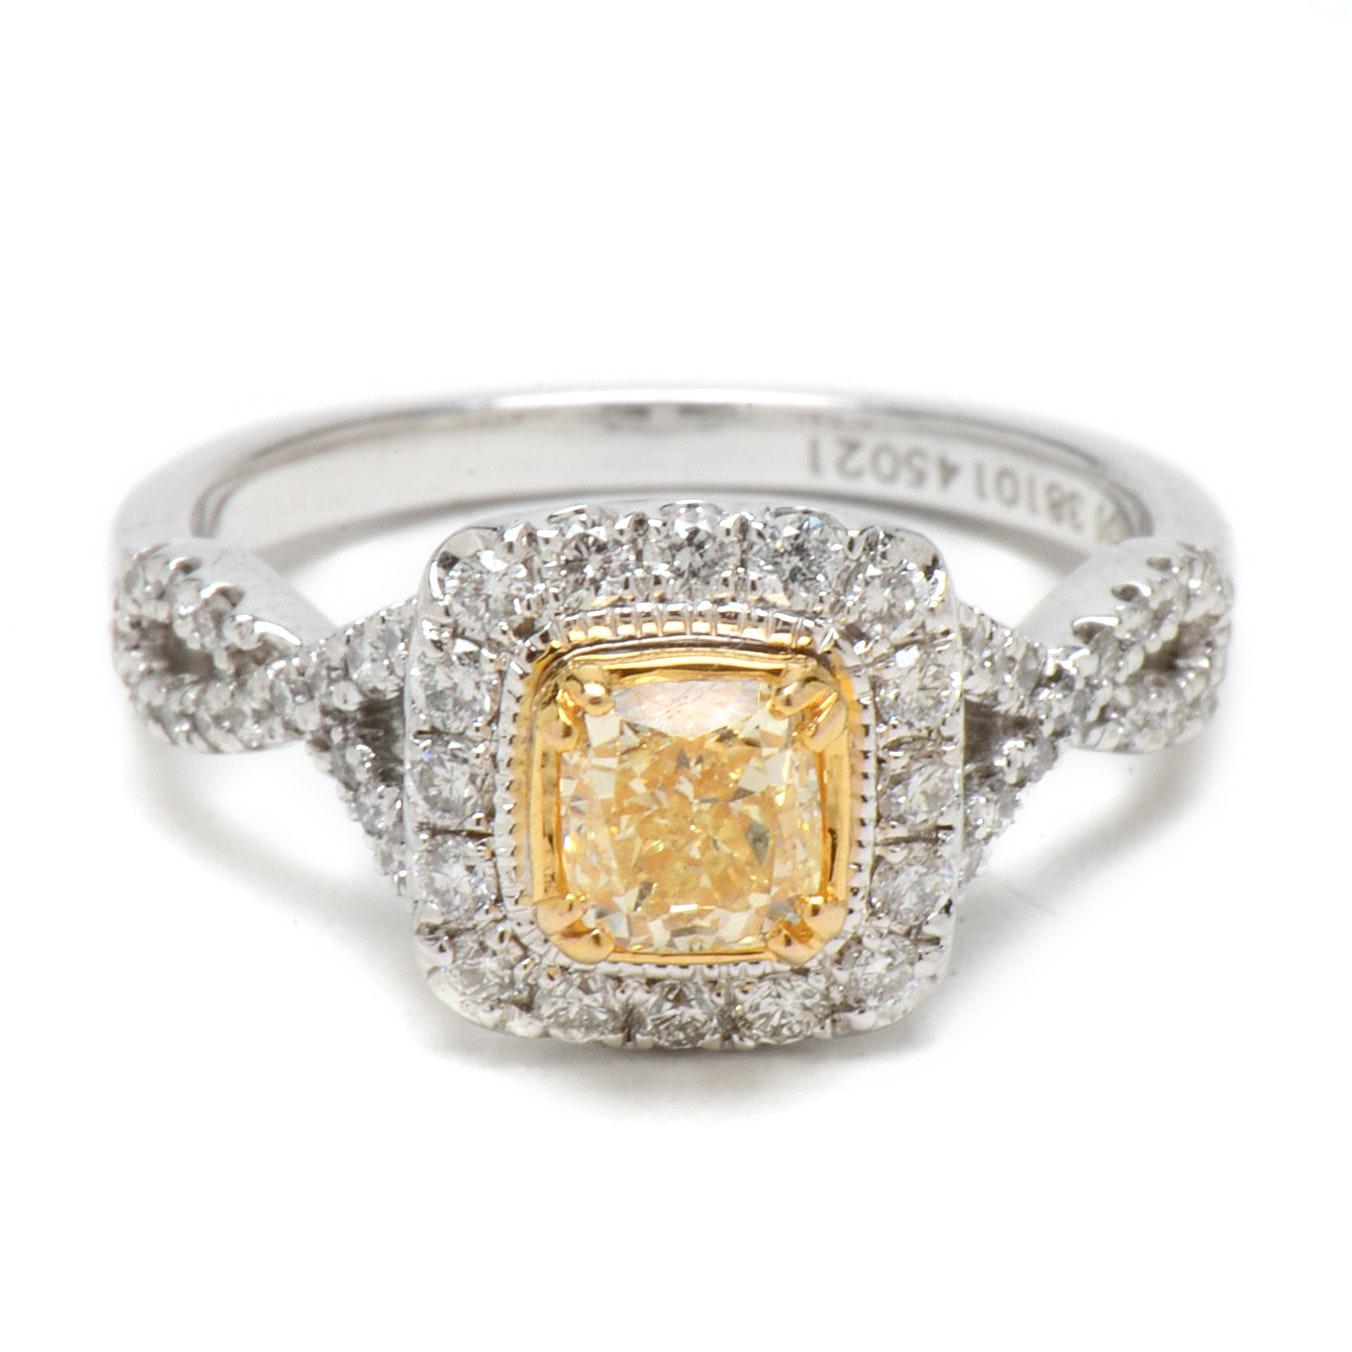 14K White Gold Light Yellow Diamond Engagement Ring